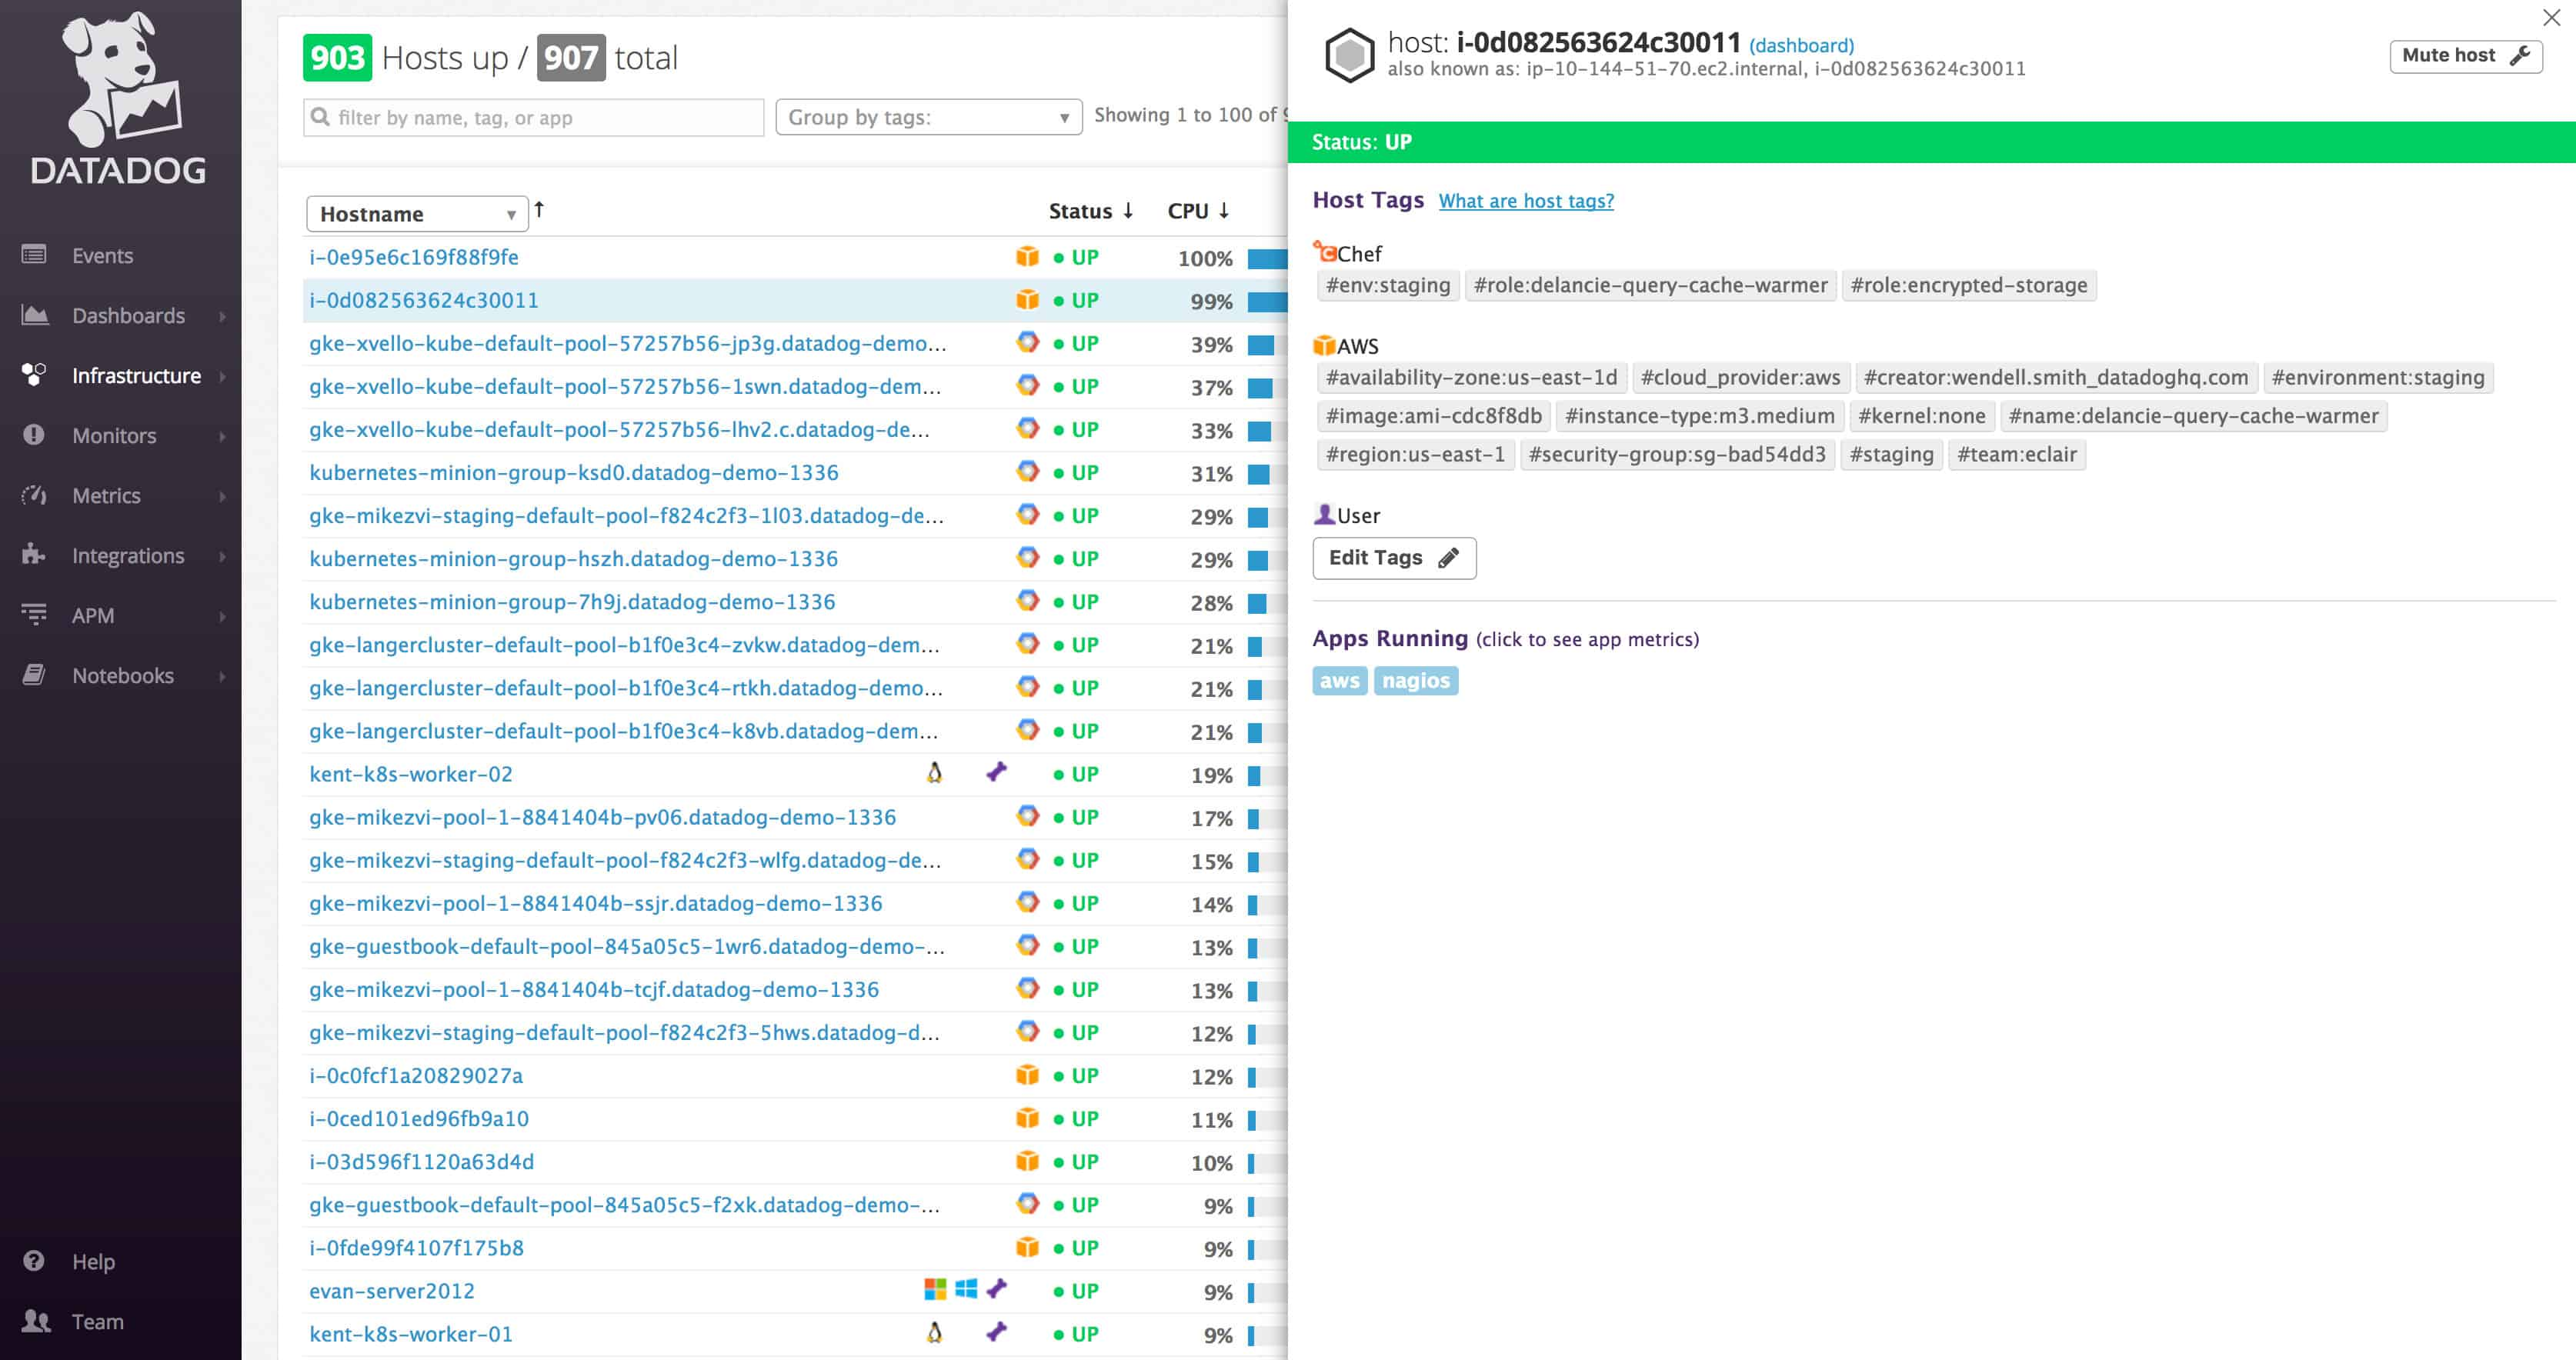 11 Best Log Analysis Tools: Top Log Analyzers Reviewed